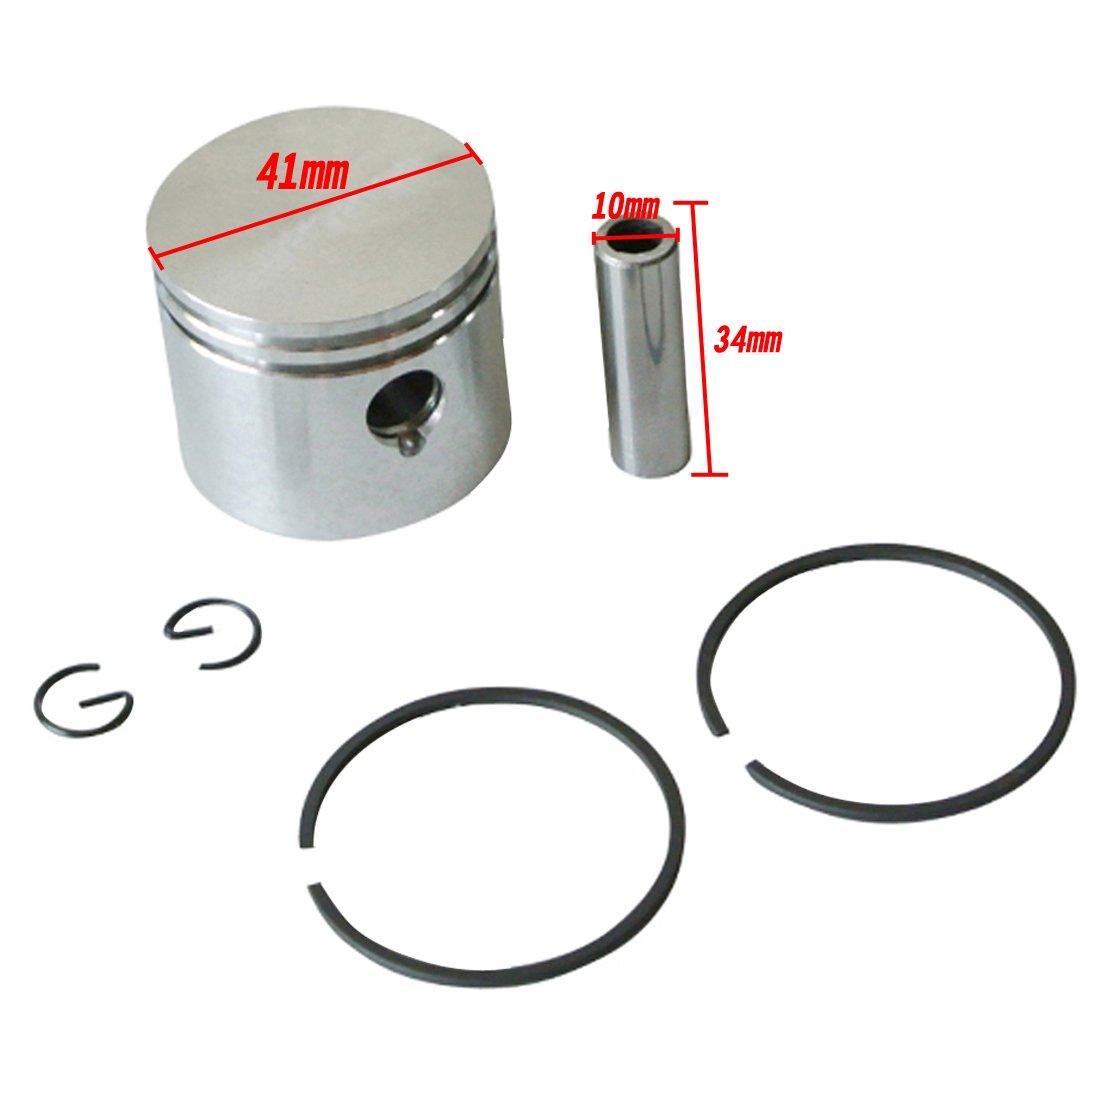 41 mm Piston kit Fit Partner Poulan 220 221 260 350 351 tronçonneuse moteur